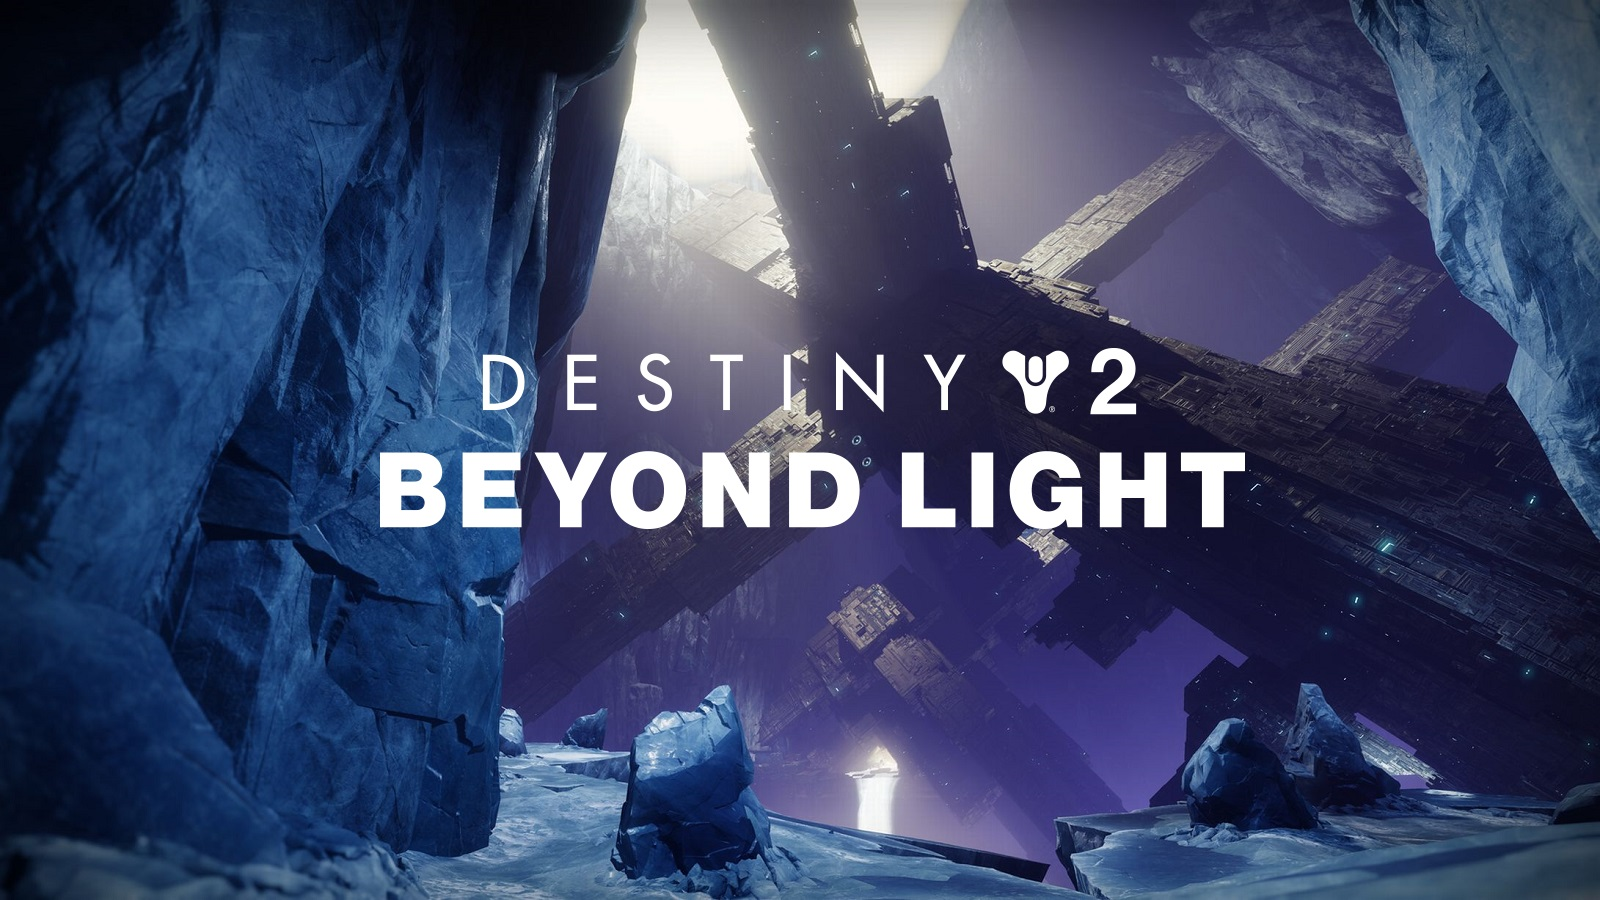 Destiny 2 Europa Vex With Beyond Light Text